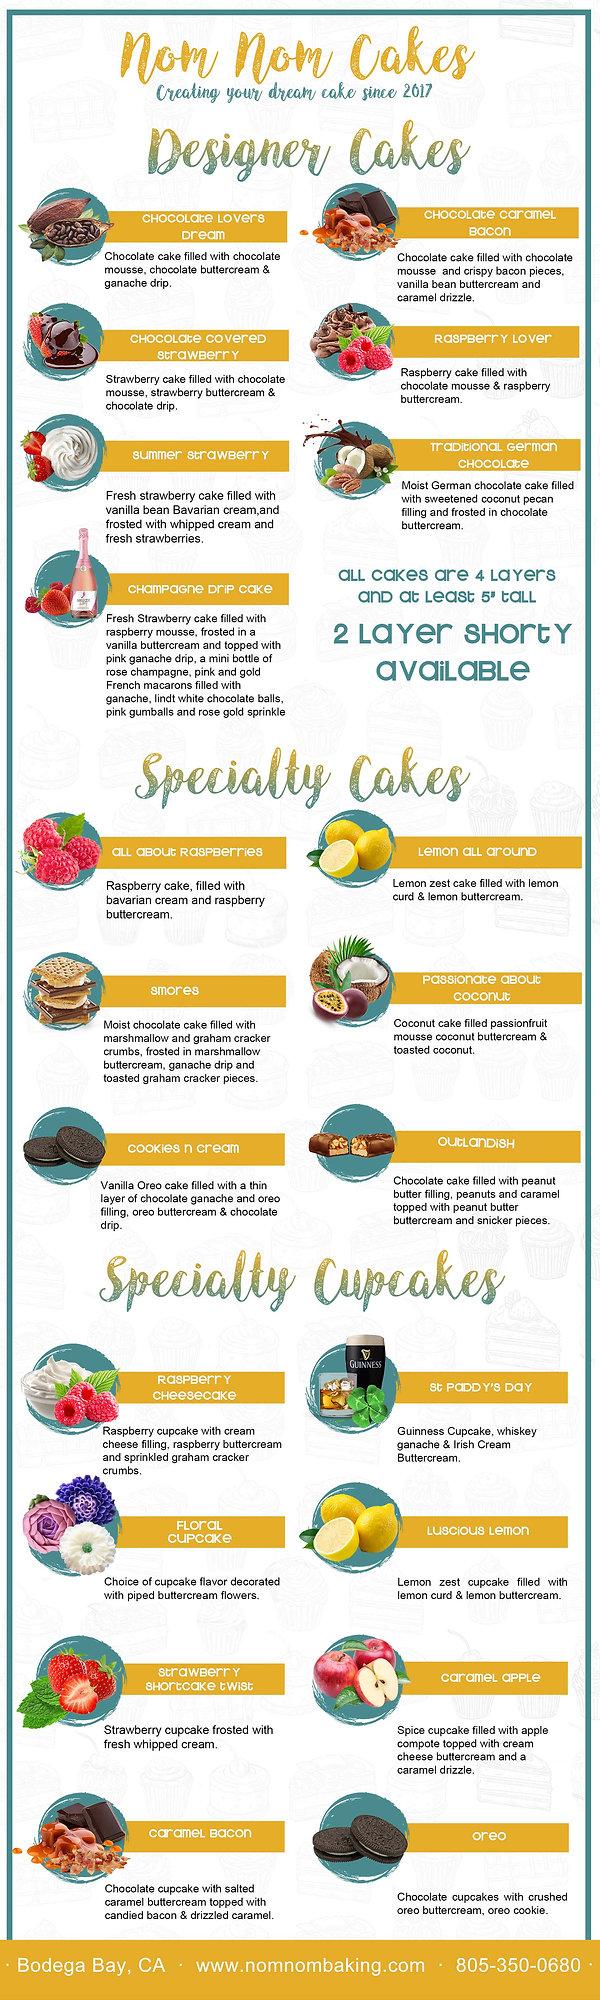 Designer-Cakes-Speciality-cupcakesWebsit